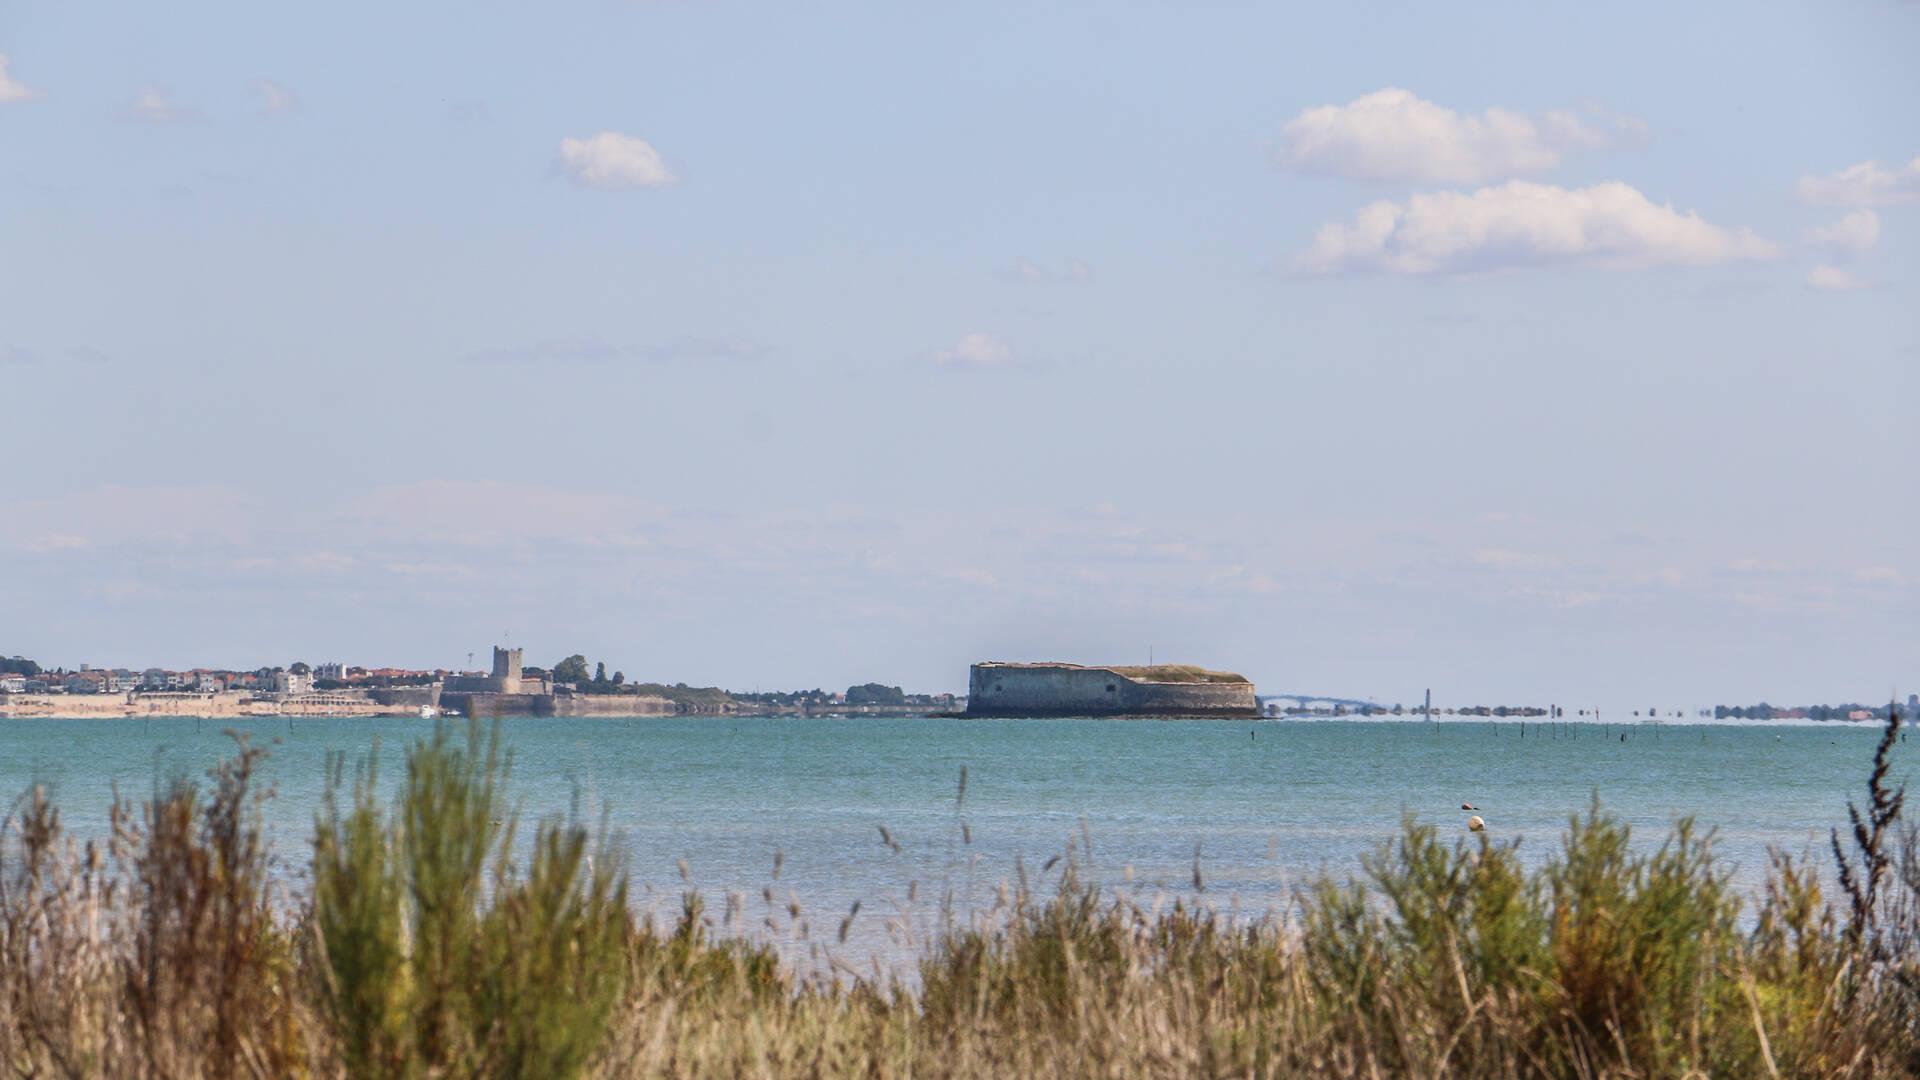 vue-fort-enet-ile-aix-rochefort-ocean© Chrystelle Ecale